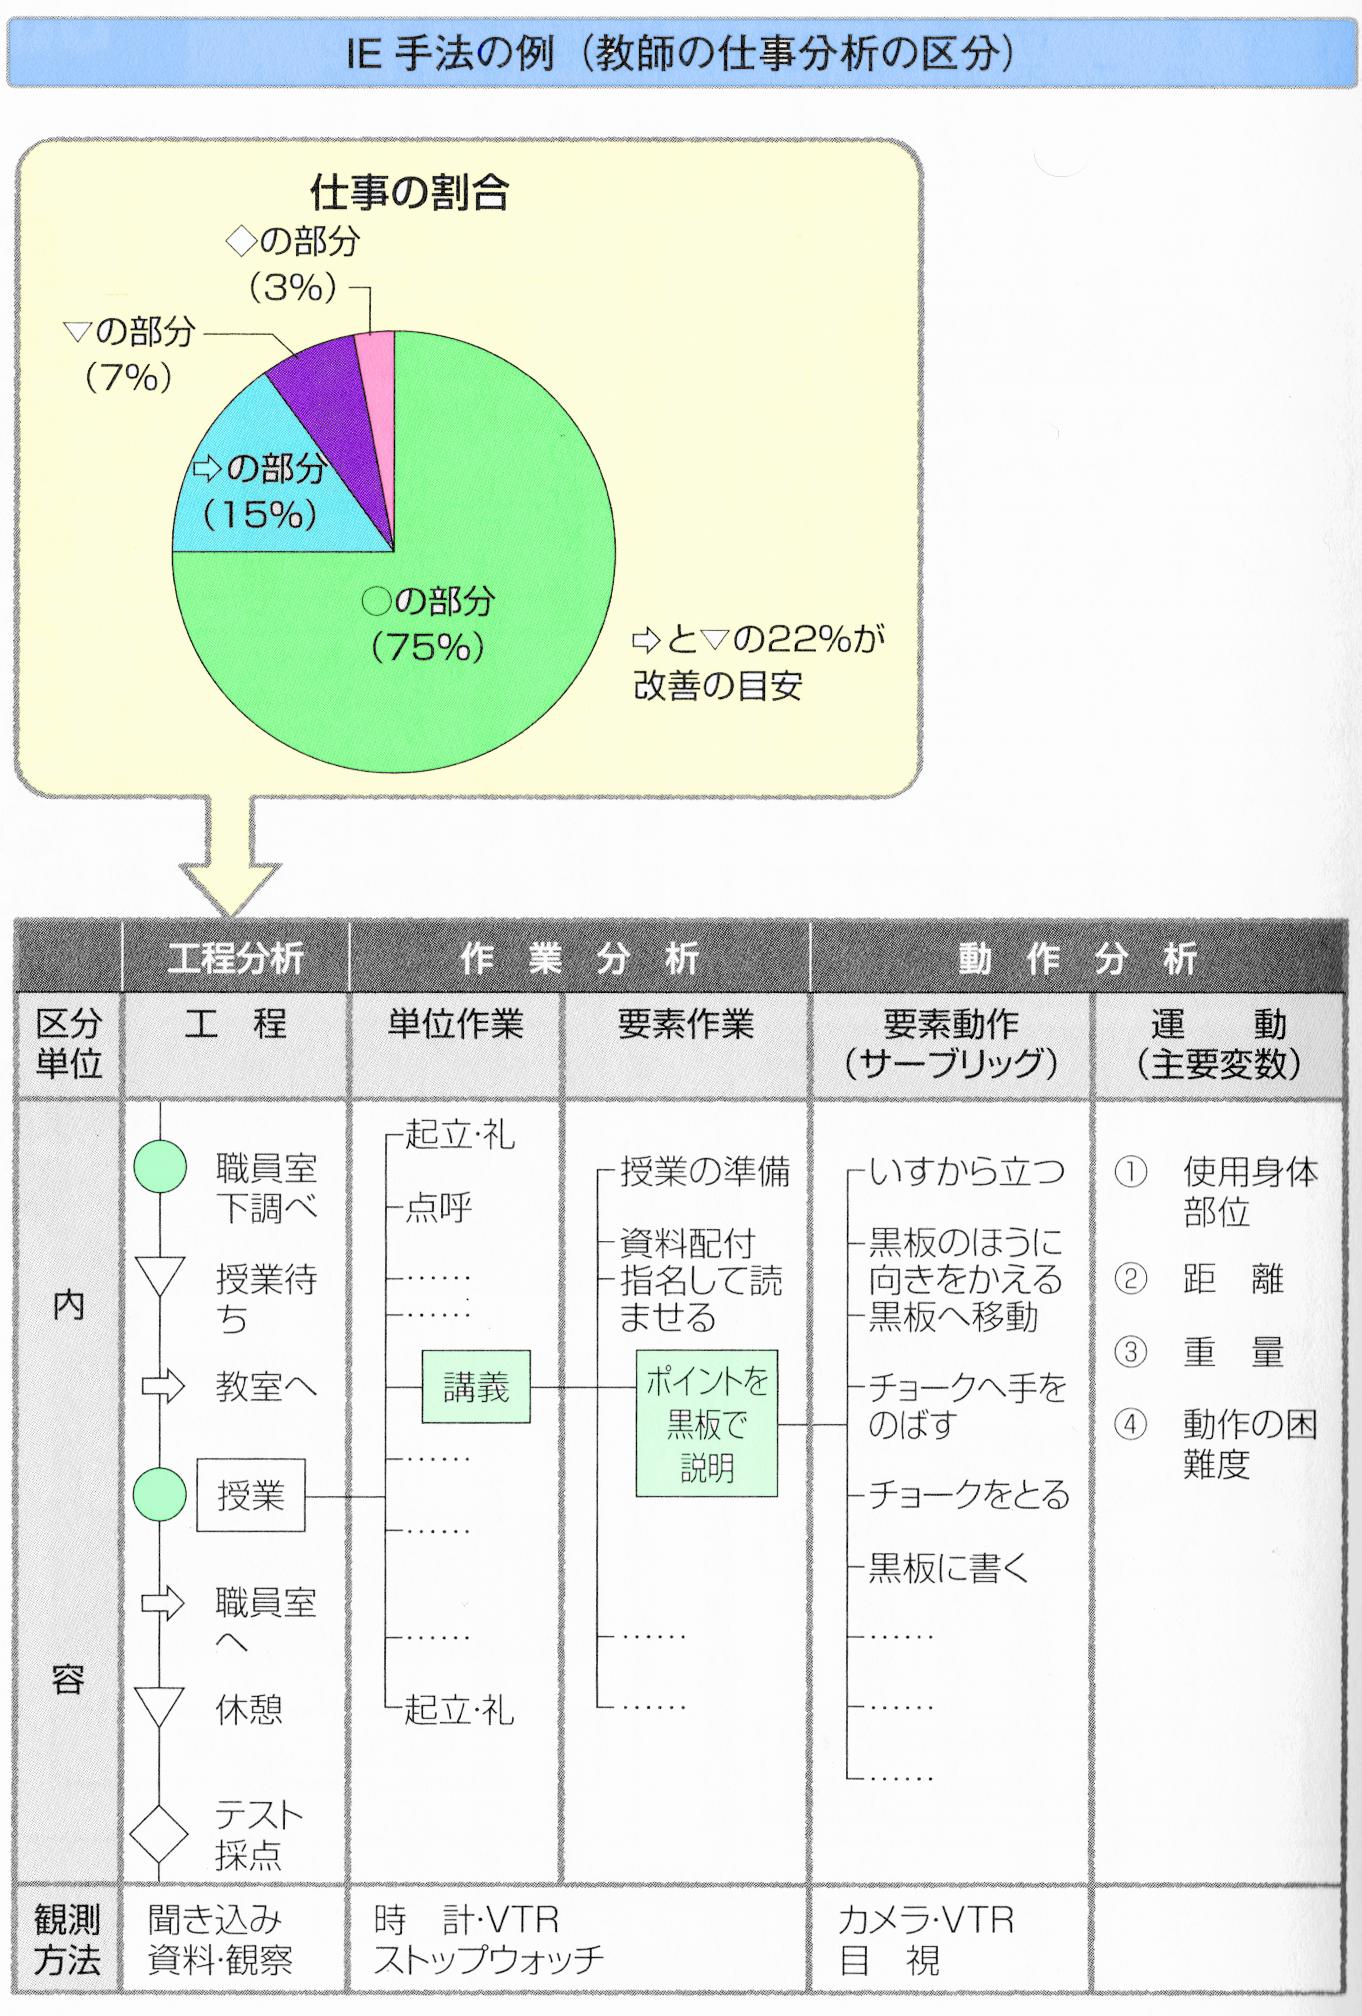 https://kaizen1.net/wp-content/uploads/2016/09/IE%E6%89%8B%E6%B3%95%E3%81%A8%E3%81%AF%EF%BC%9F.png